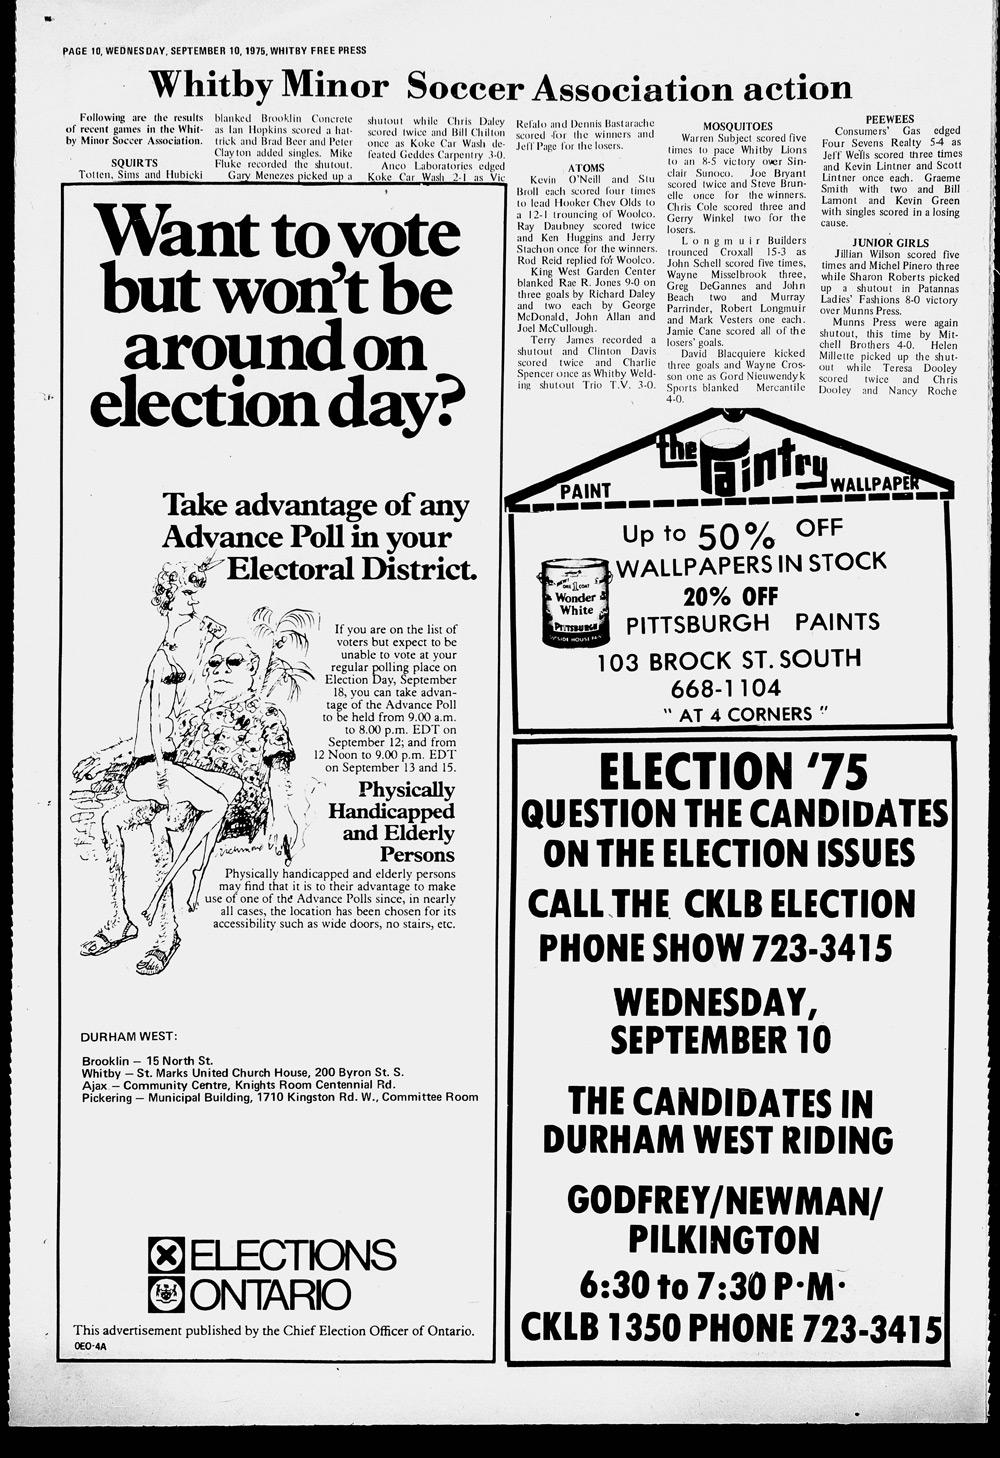 Whitby Free Press, 10 Sep 1975